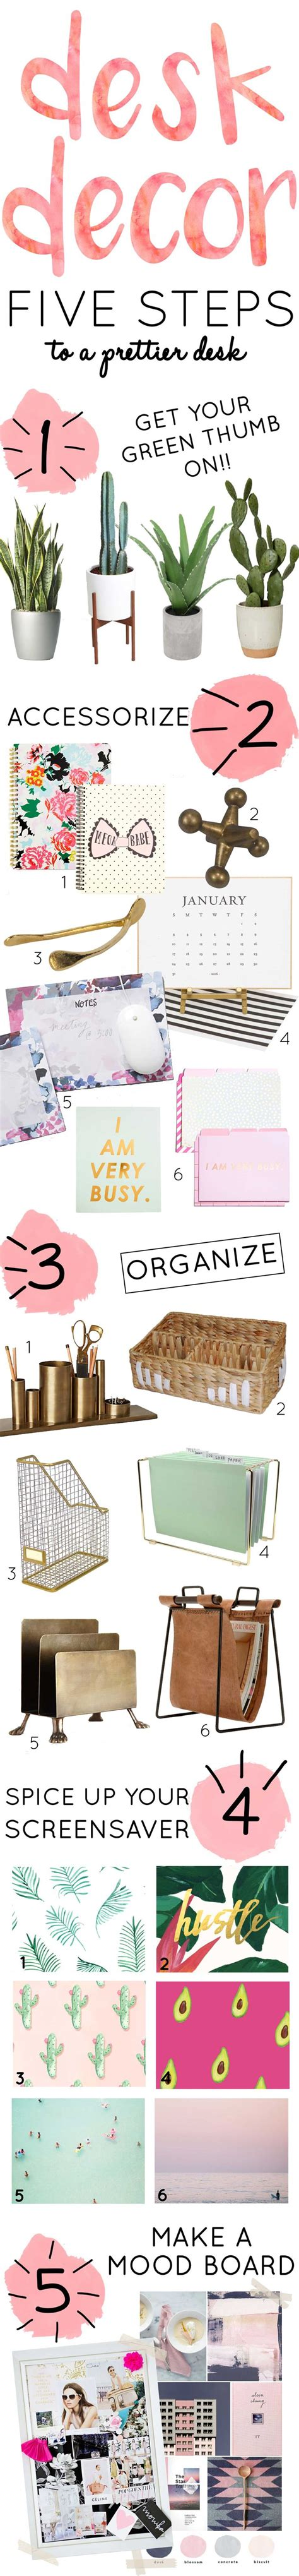 faux designs desk calendar best 25 work desk ideas on pinterest work desk decor